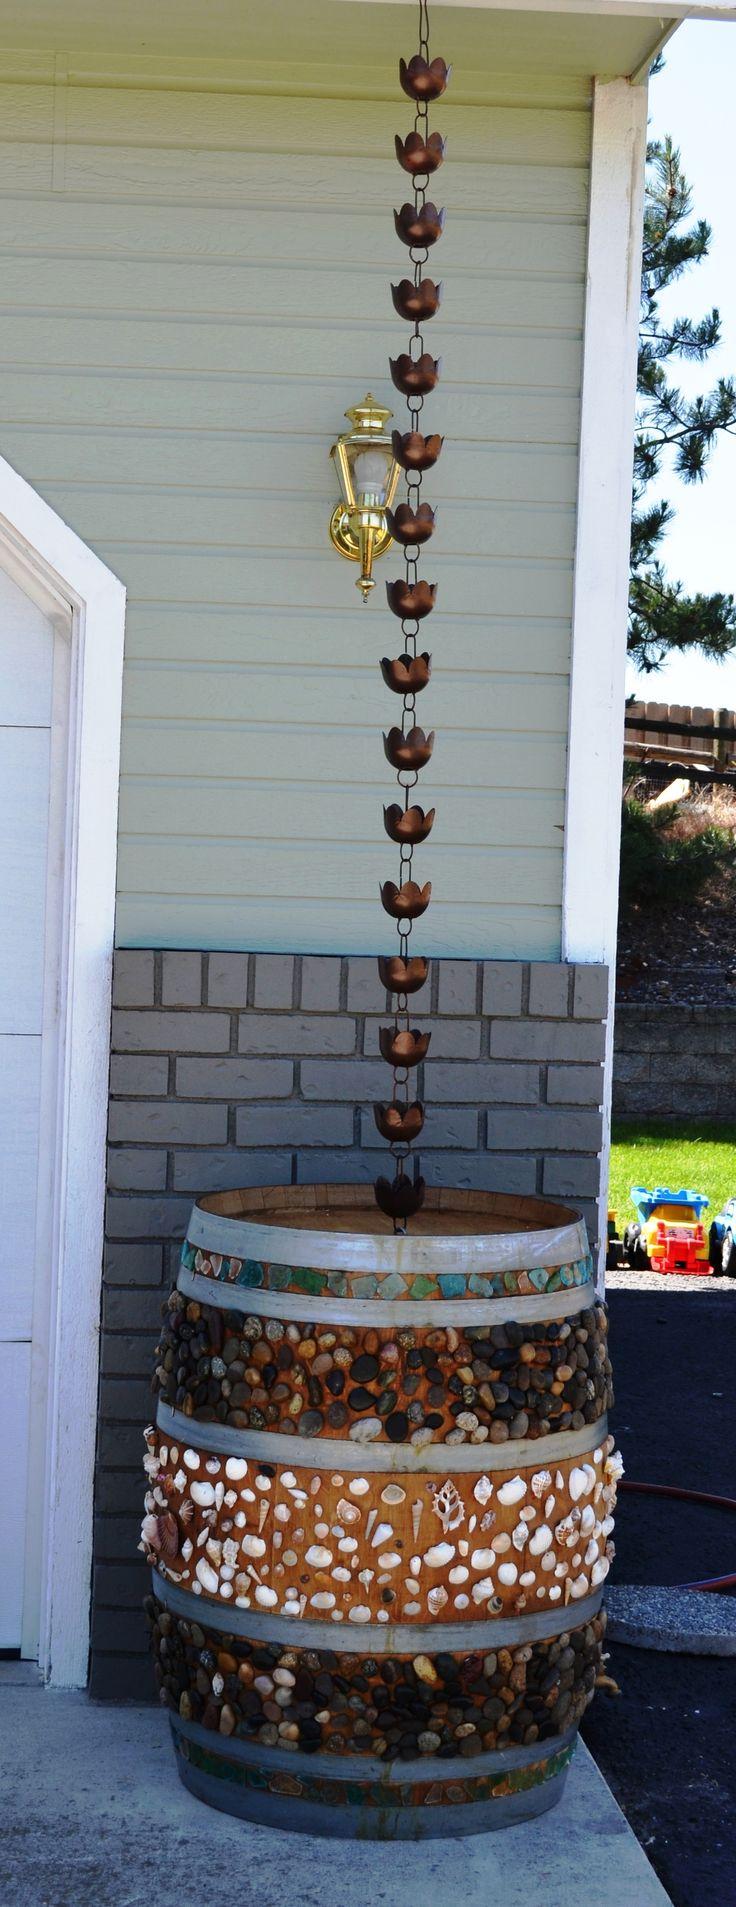 50 Best Rain Barrel Decorating Ideas Images On Pinterest -2064